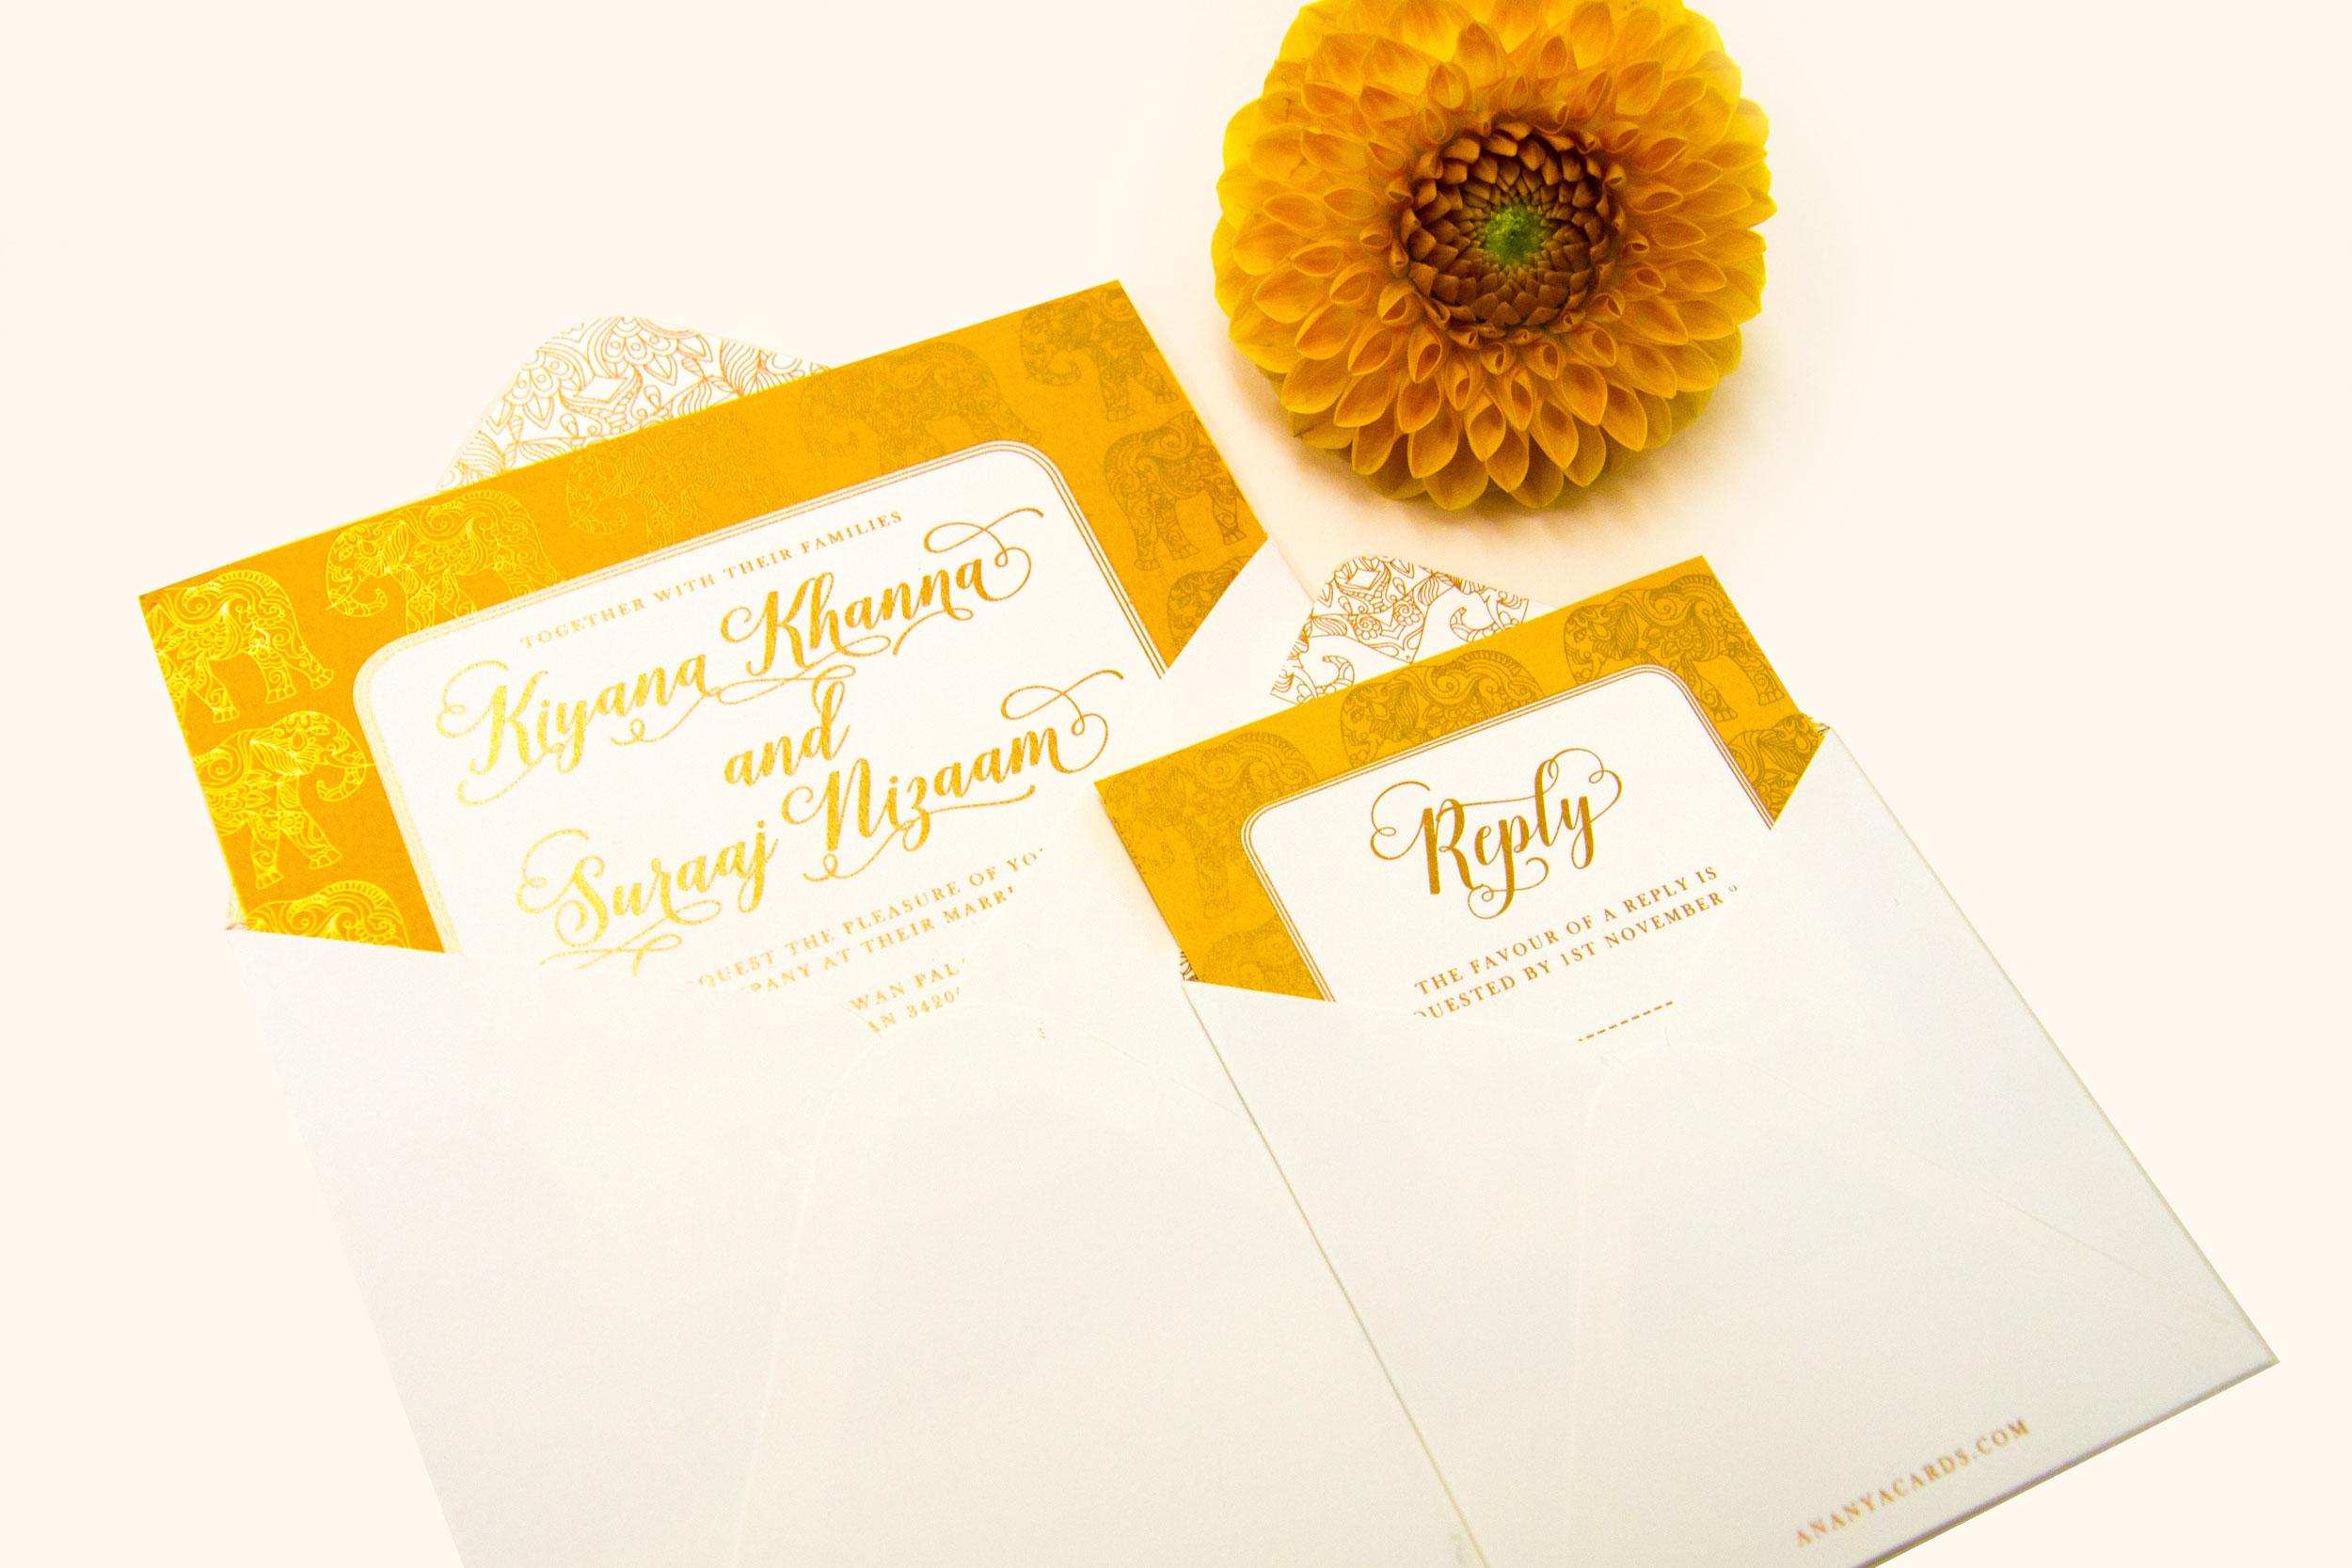 trio-of-life-gold-elephant-reply-card-wedding-invitation.jpg